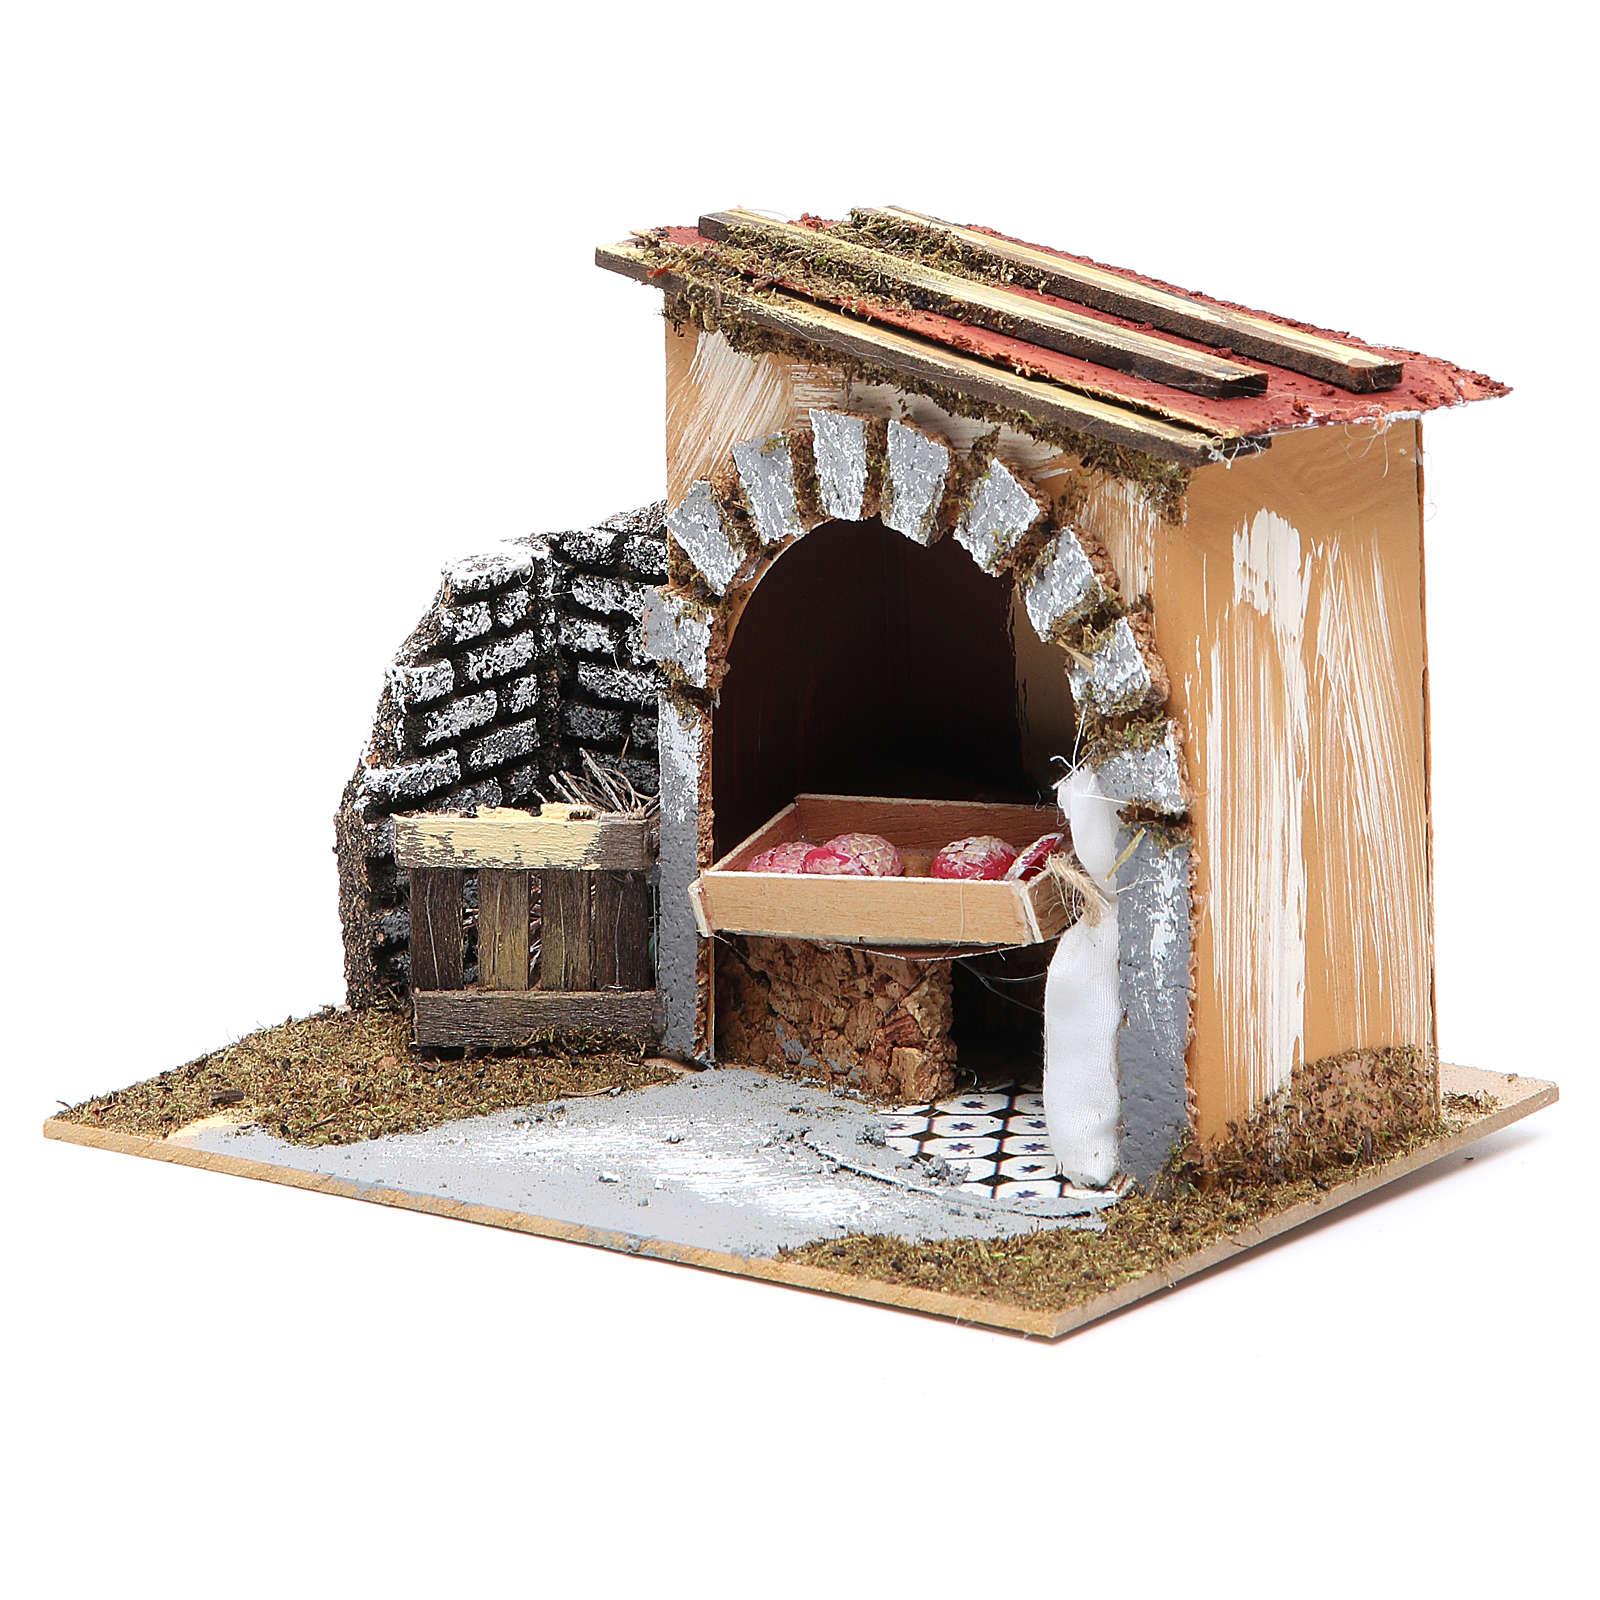 Baker's shop for nativities measuring 14x20x14cm 4